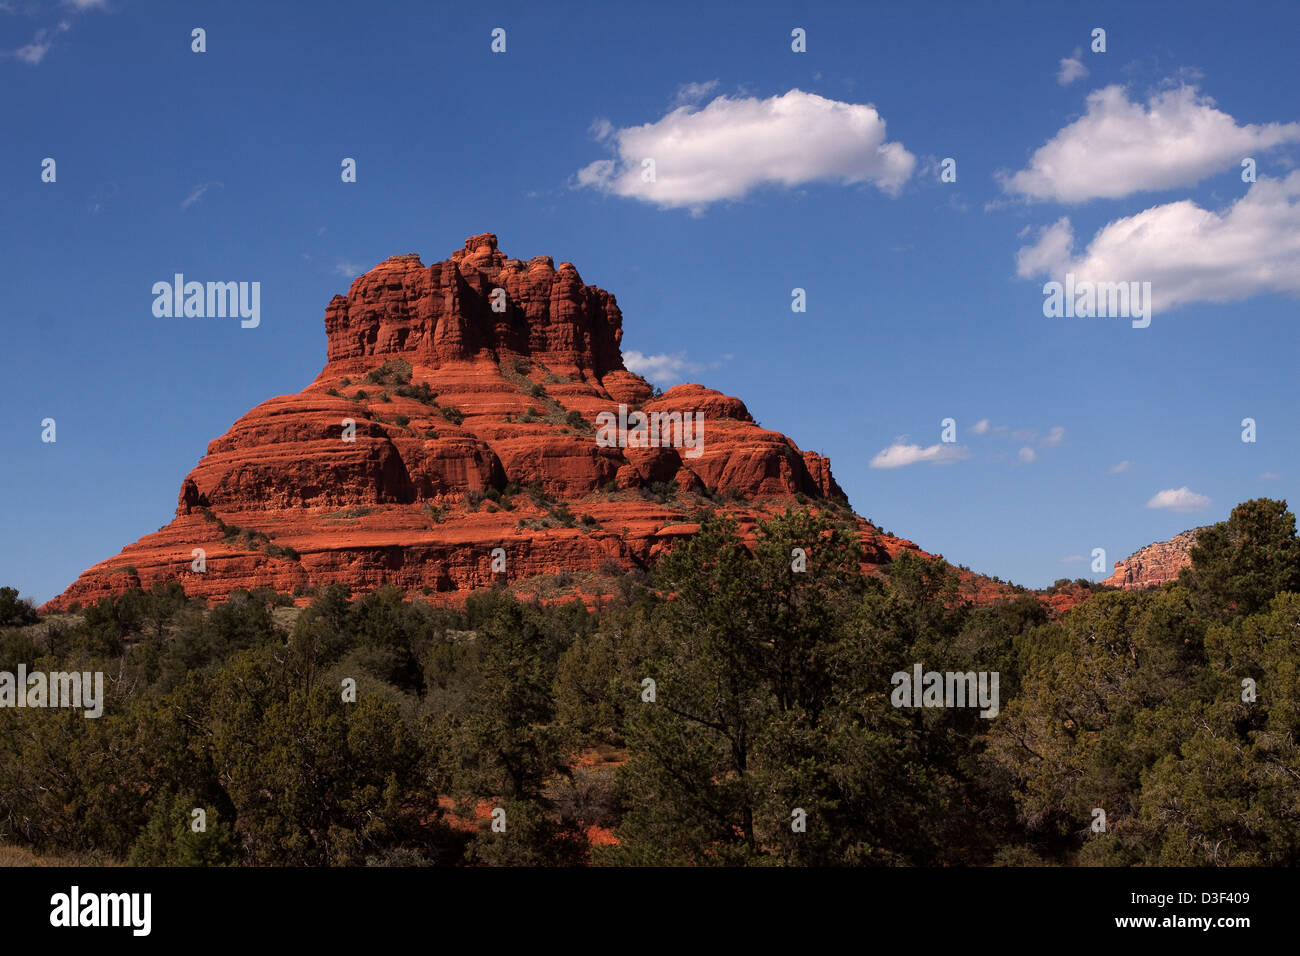 Bell Rock in Sedona, AZ - Stock Image